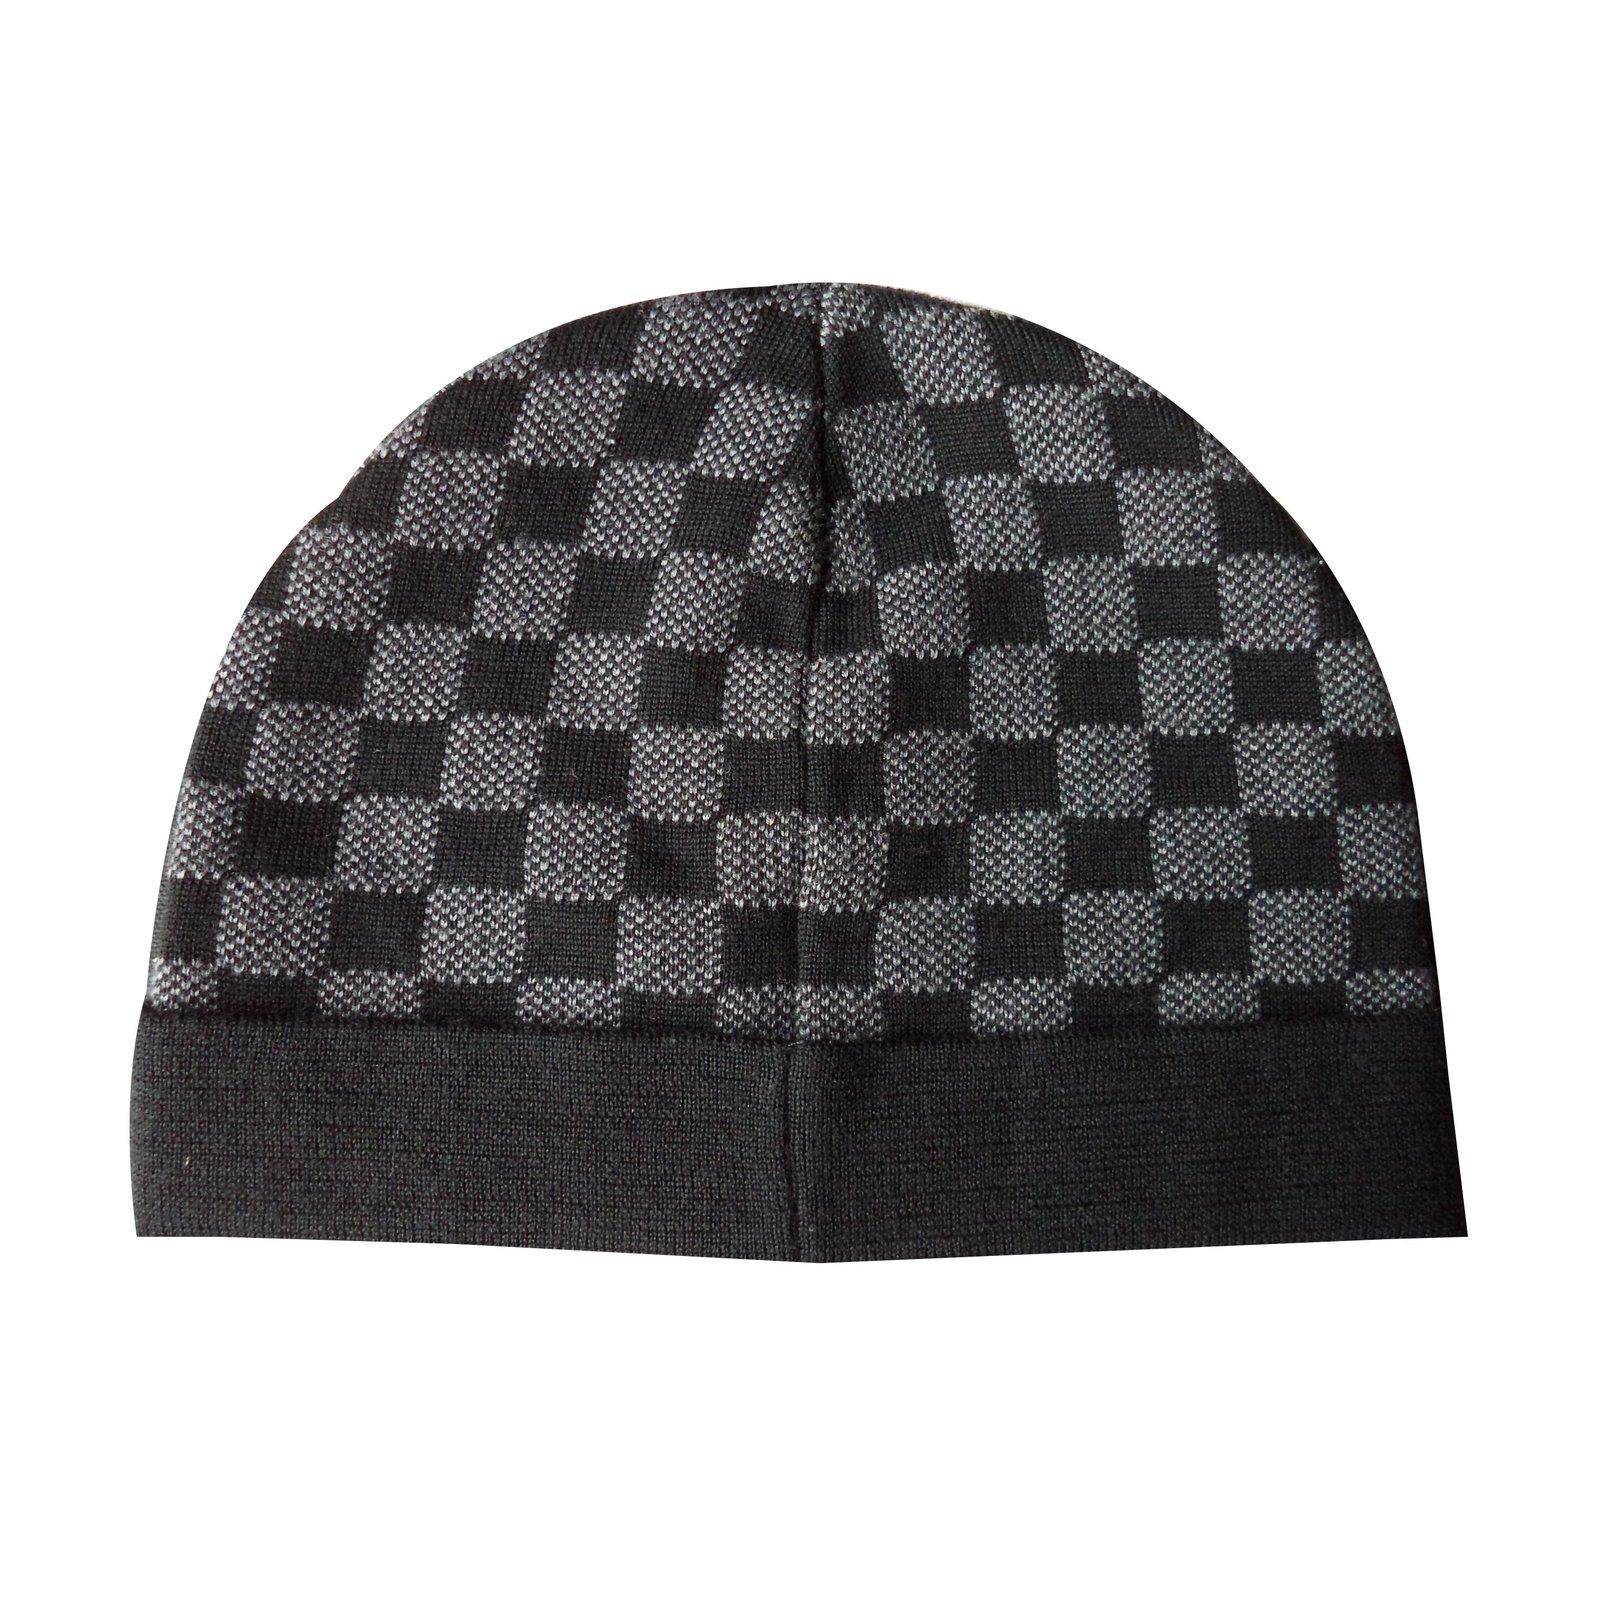 Louis Vuitton Hats Beanies Hats Beanies Wool Grey ref.53168 - Joli ... 15abd457893